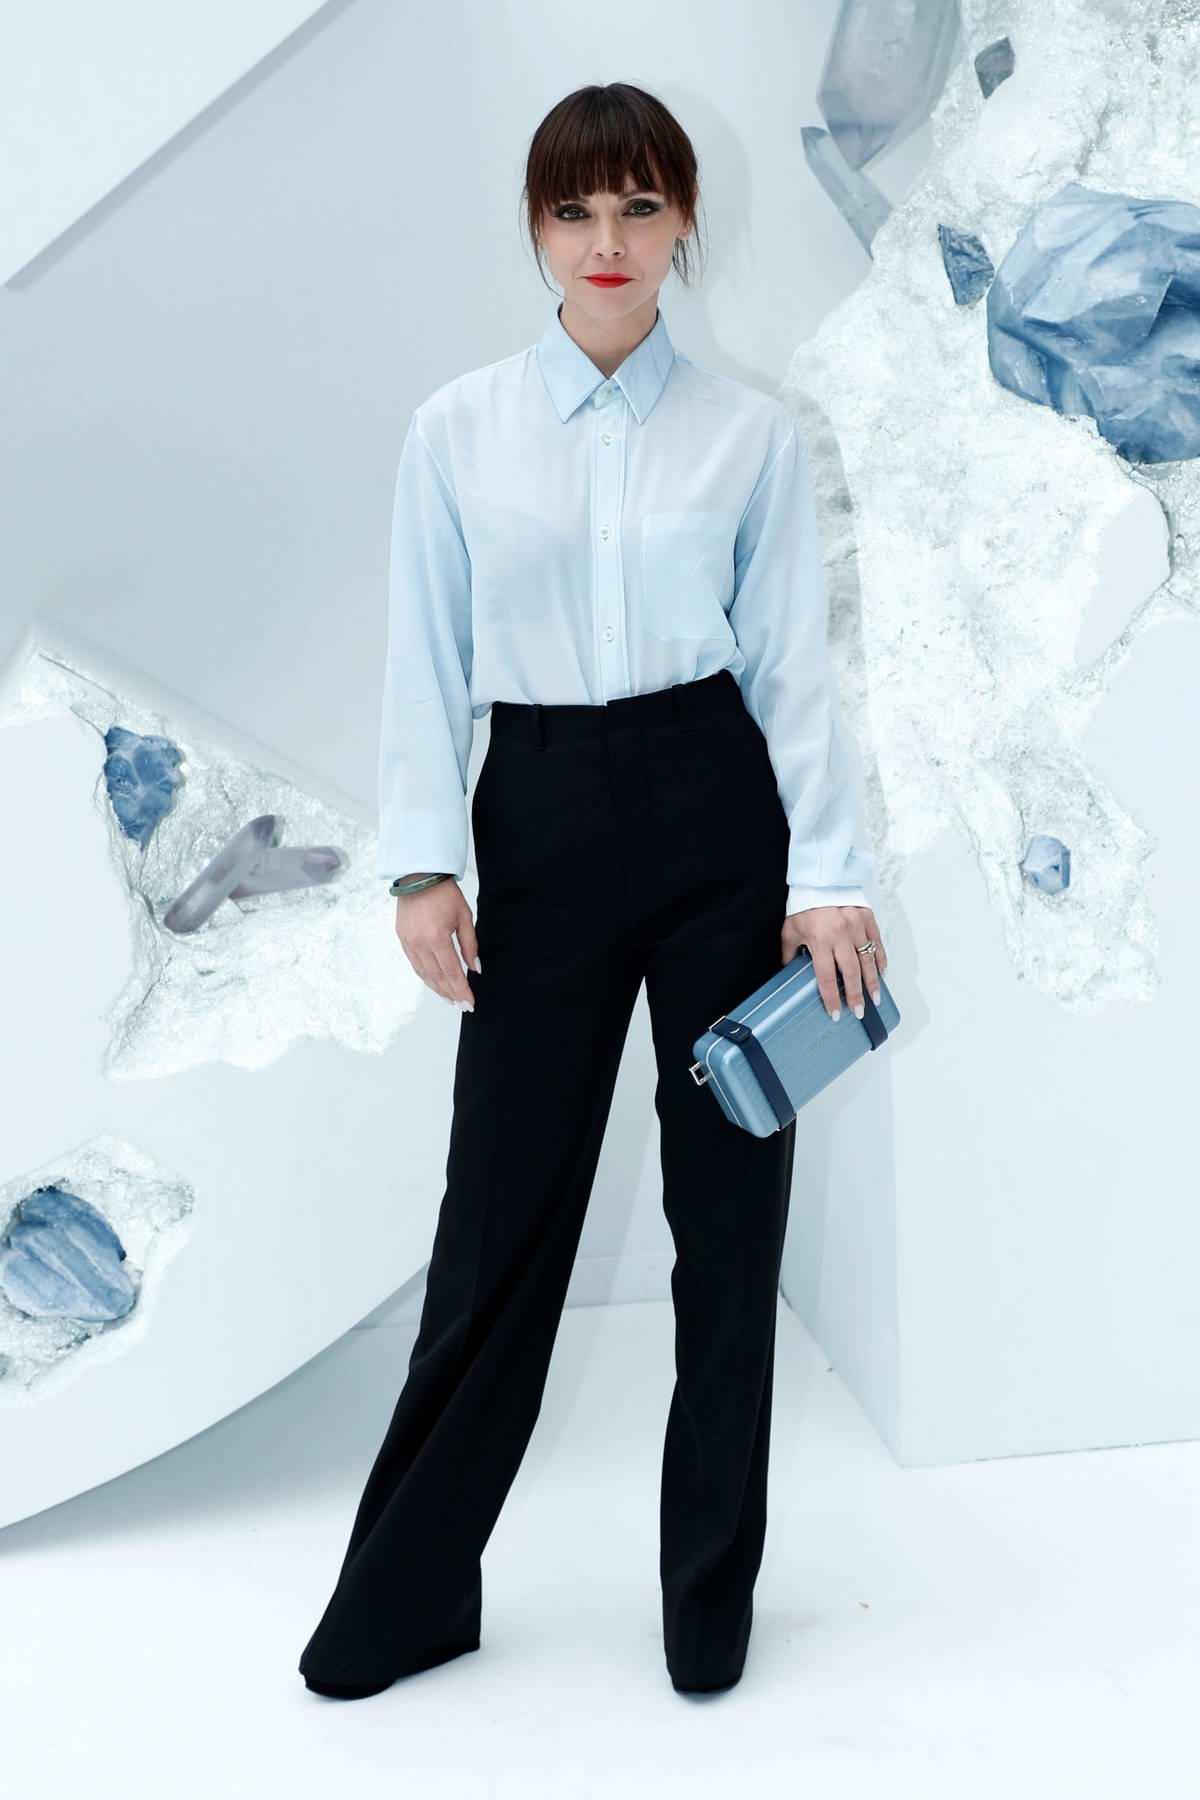 Christina Ricci attends the Dior Homme Menswear Spring/Summer 2020 show during Paris Fashion Week in Paris, France